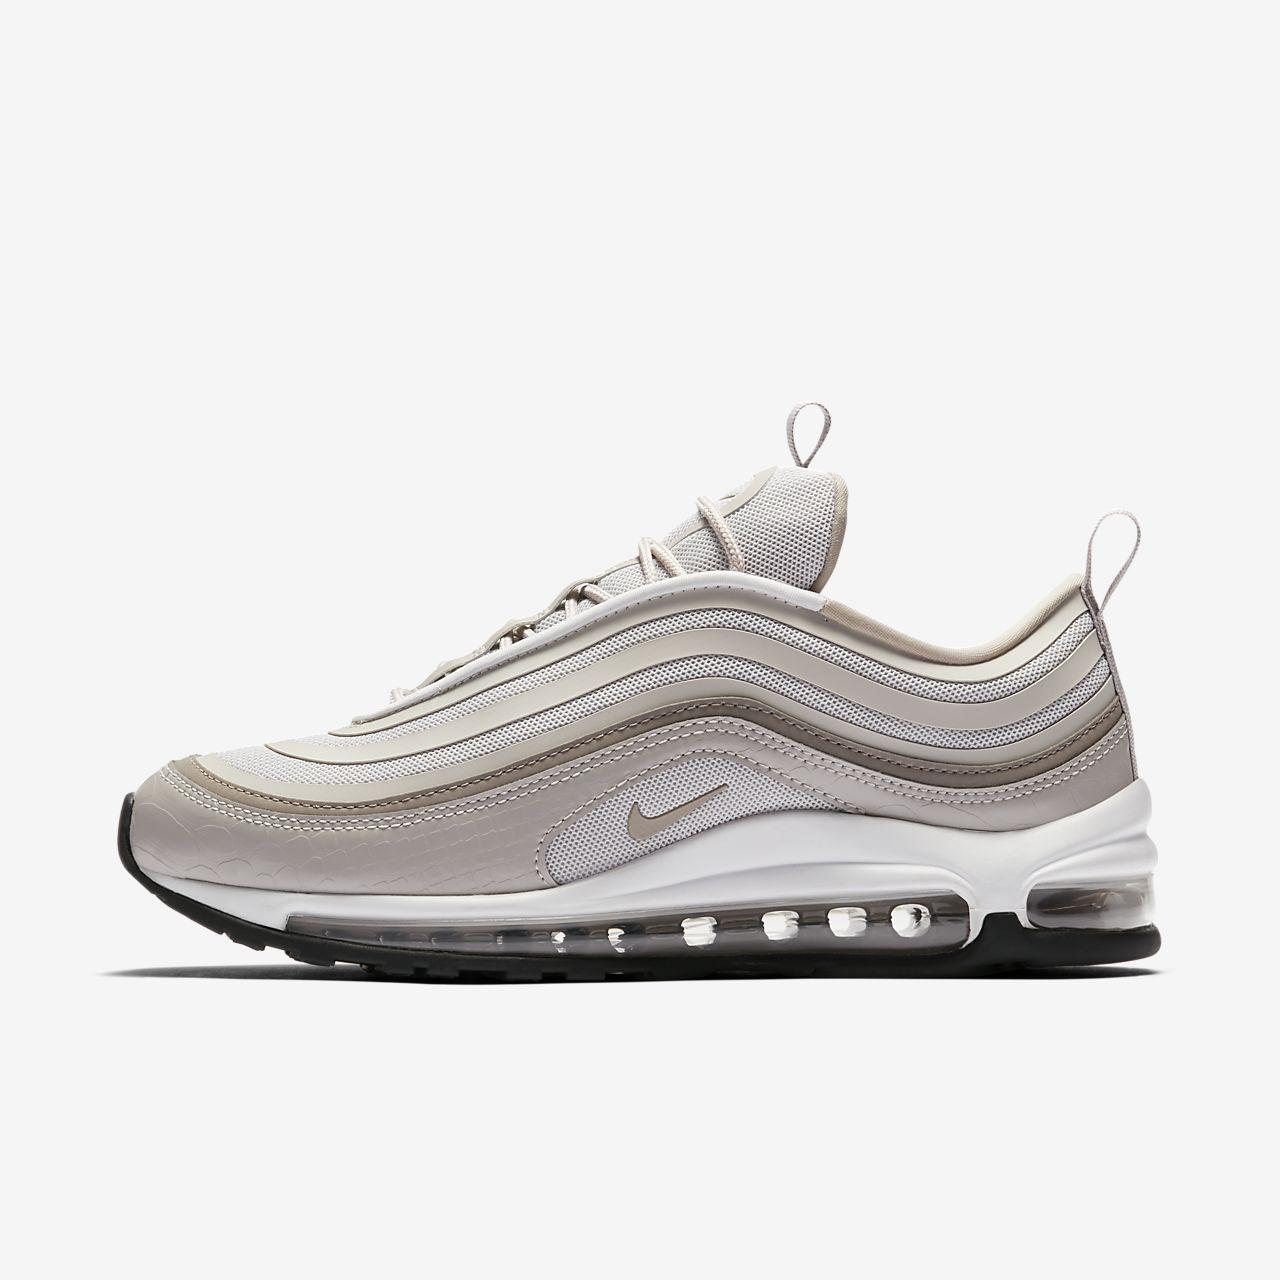 50c5210b1b6dc9 Nike Air Max 97 Ultra 17 Damen Schuhe Black Größe 41 Angebote Online ...